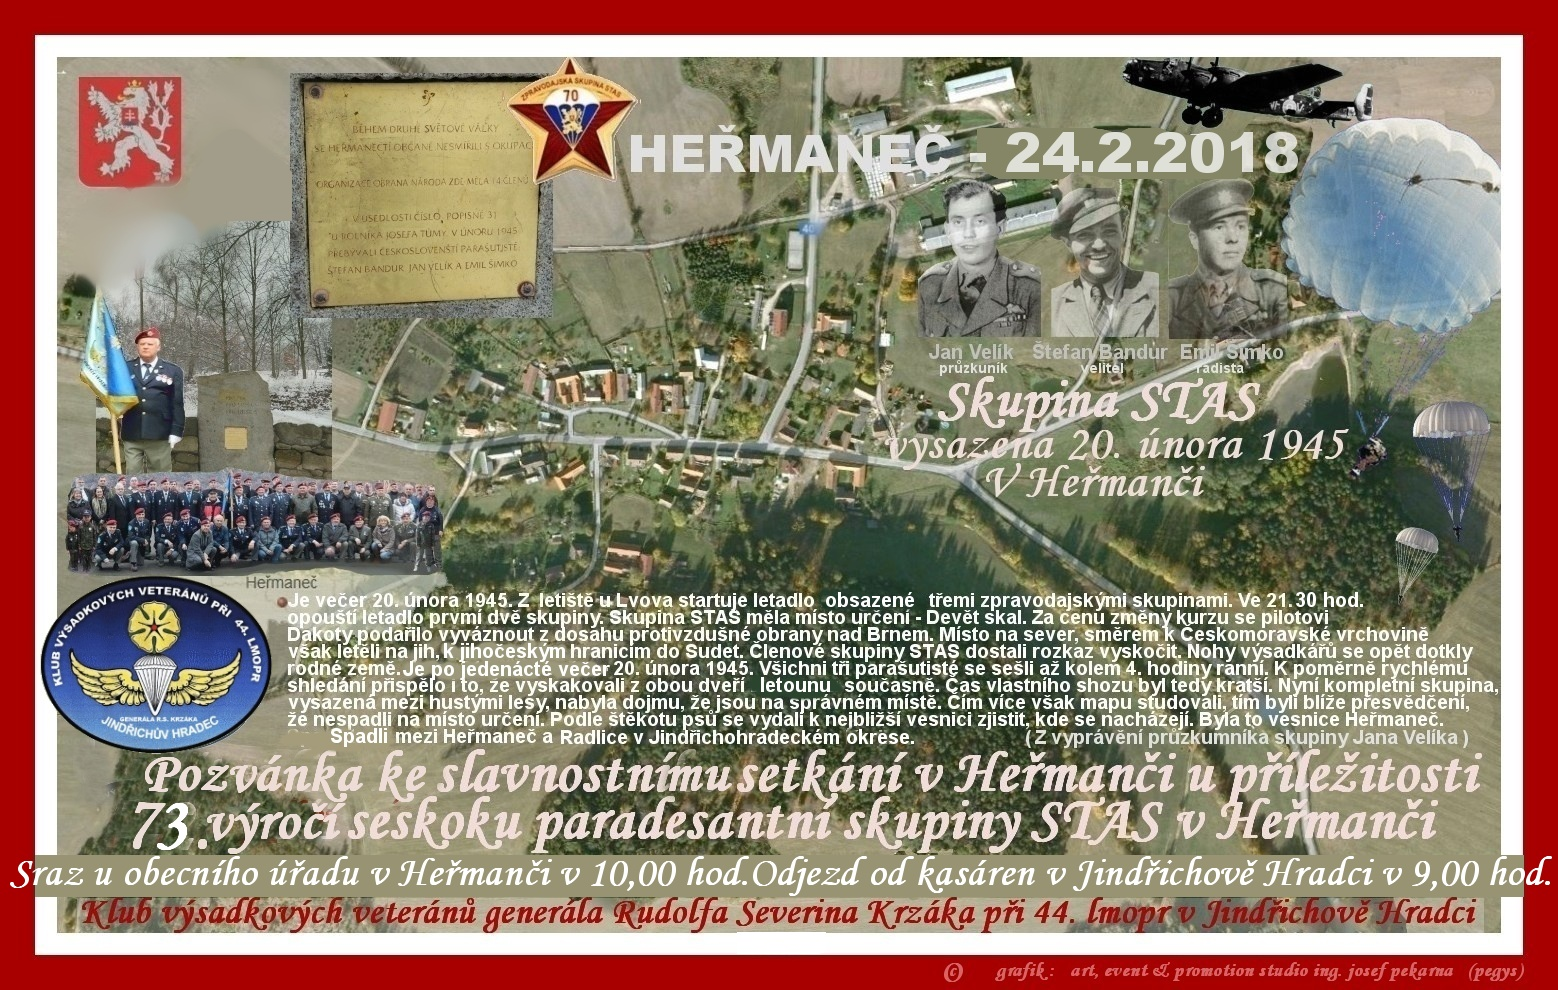 2018.02.24 - Pozvánka Heřmaneč